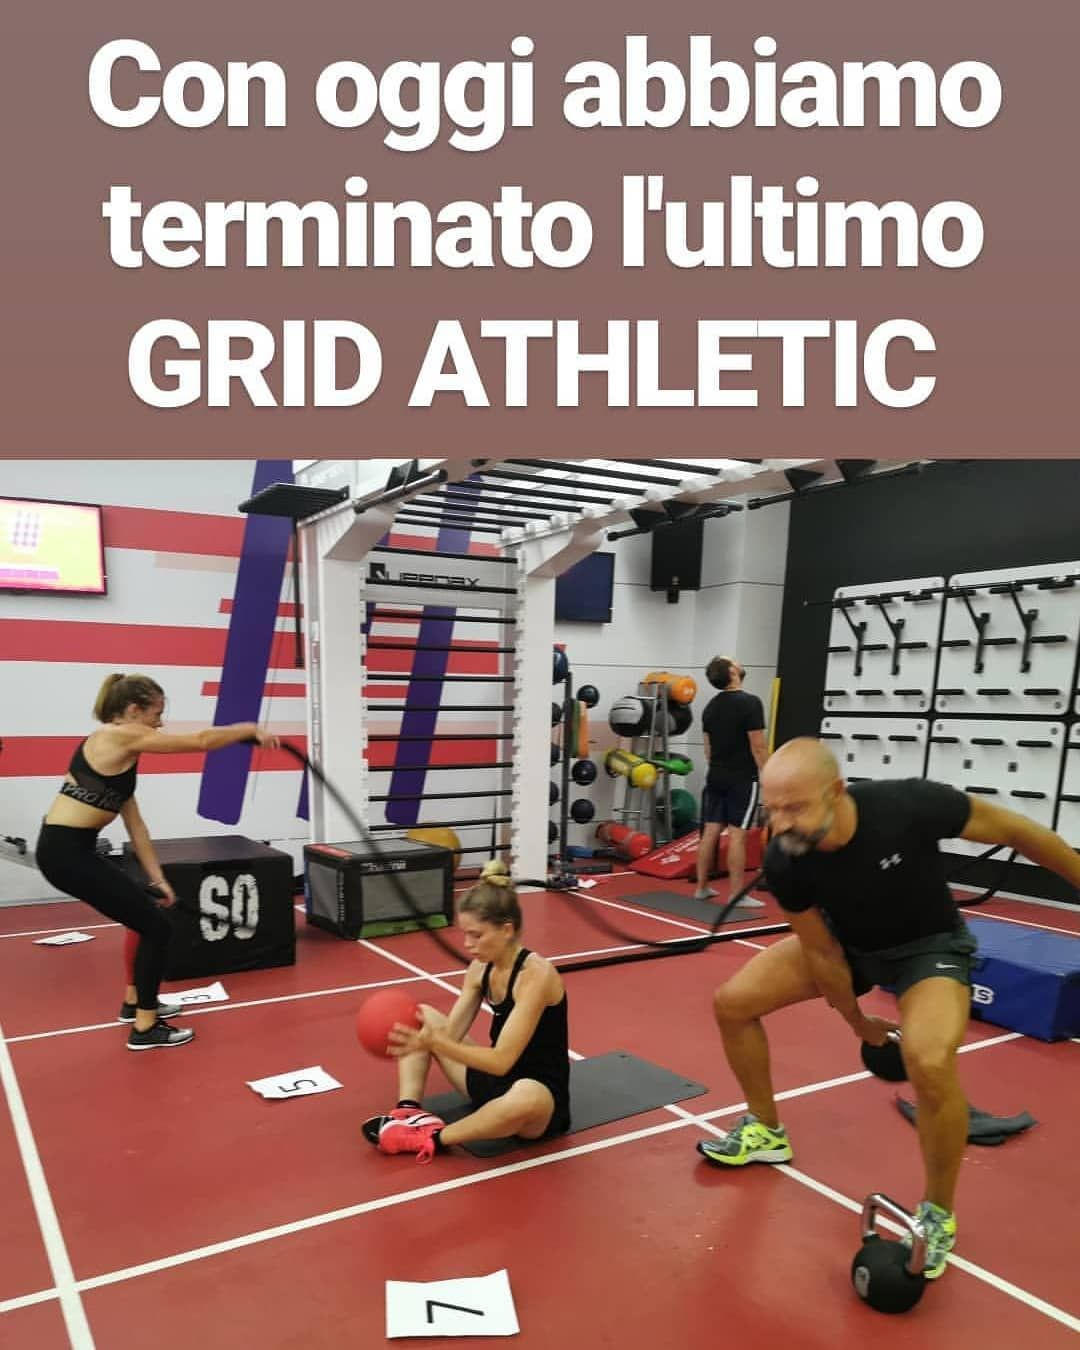 Grid Athletic Riccardolaferrara Riccardolaferrarapersonaltrainer Esercizi Workout Dieta Dietasana Milano Allename Workout Plan Workout Personal Trainer